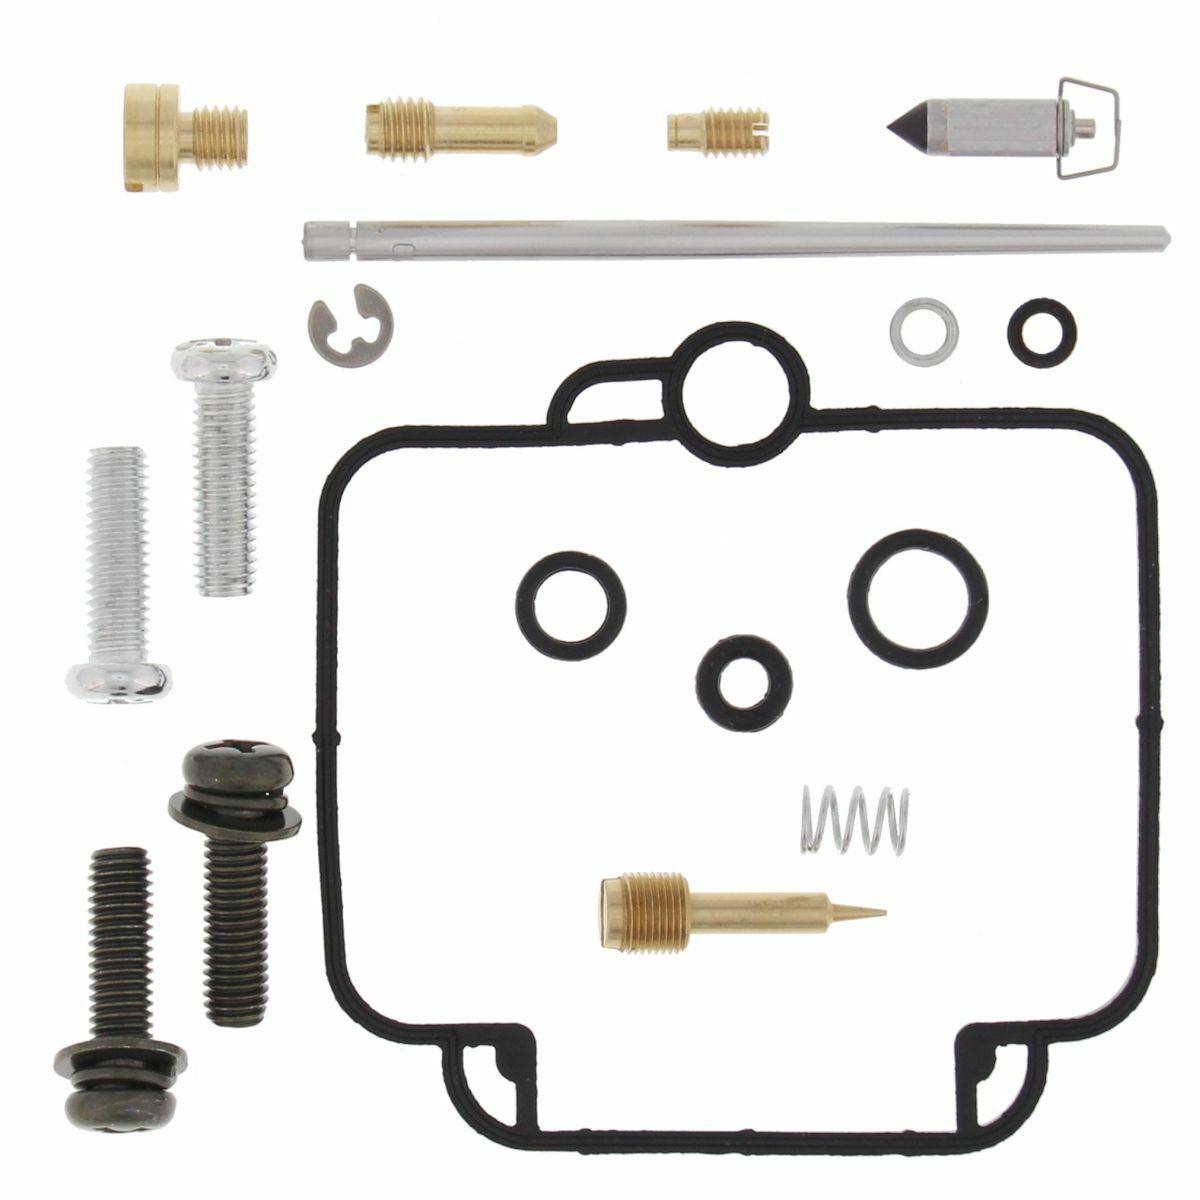 Obrázek produktu Carburetor Rebuild Kit All Balls Racing 26-1105